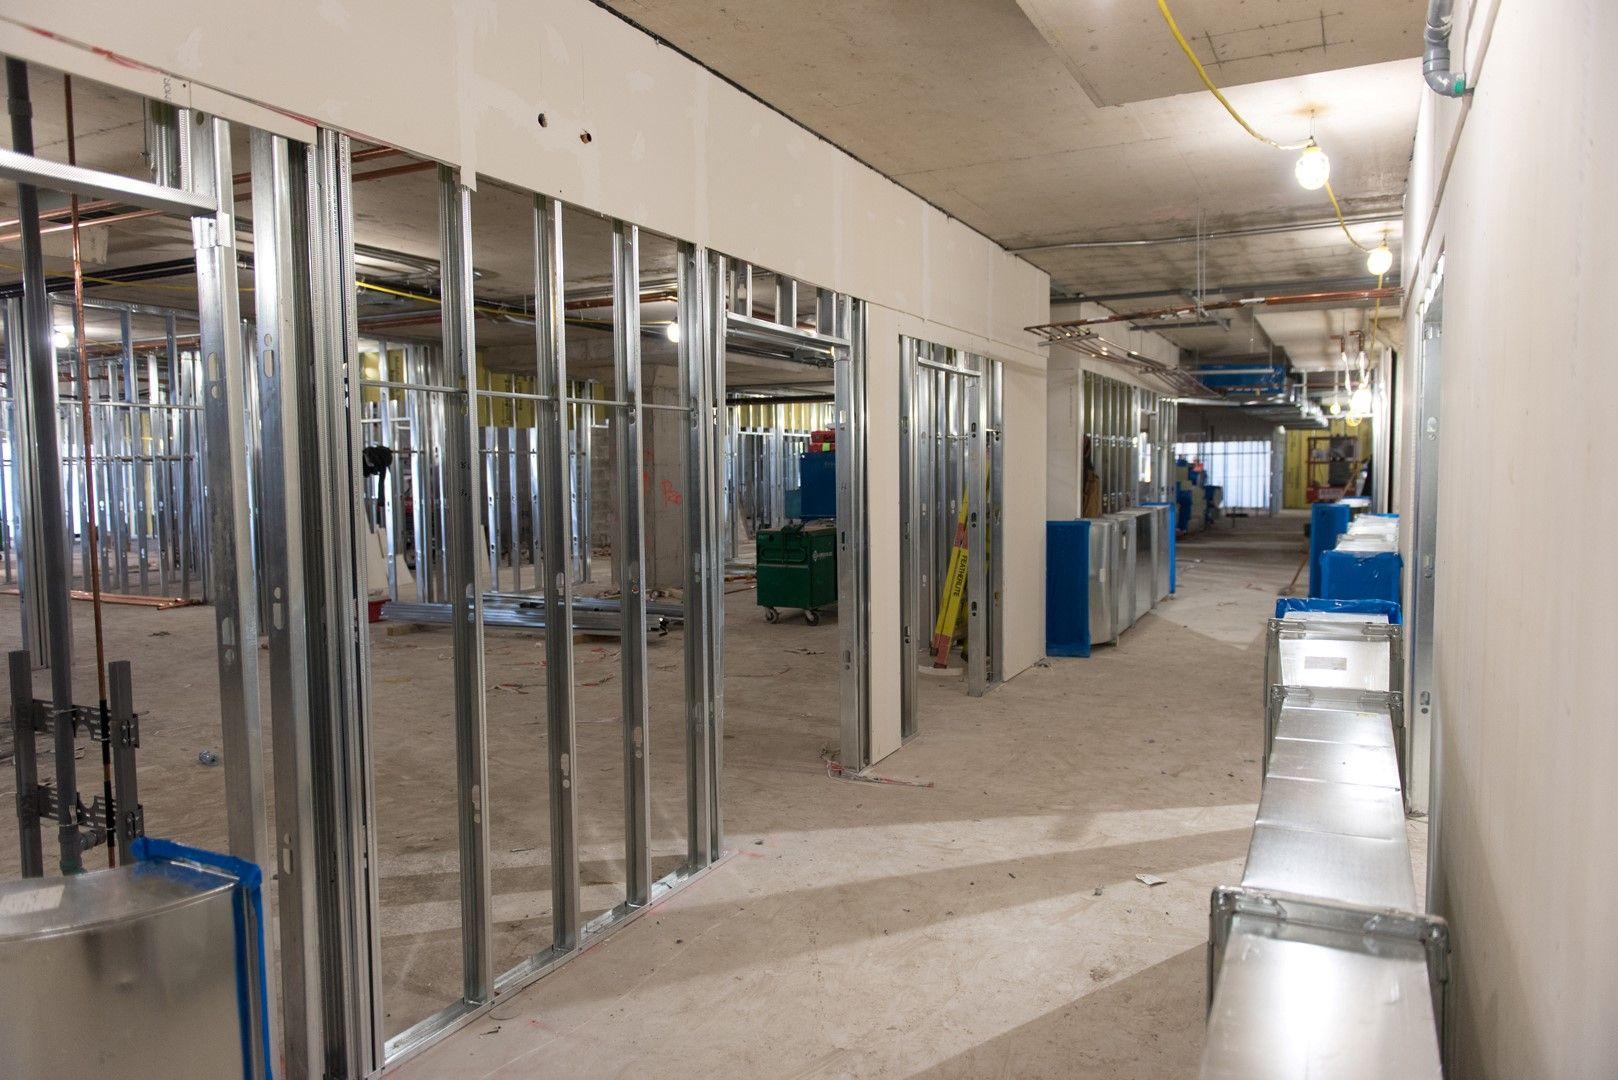 Joseph Brant Hospital project update. #healthcare #BurlON #architecture